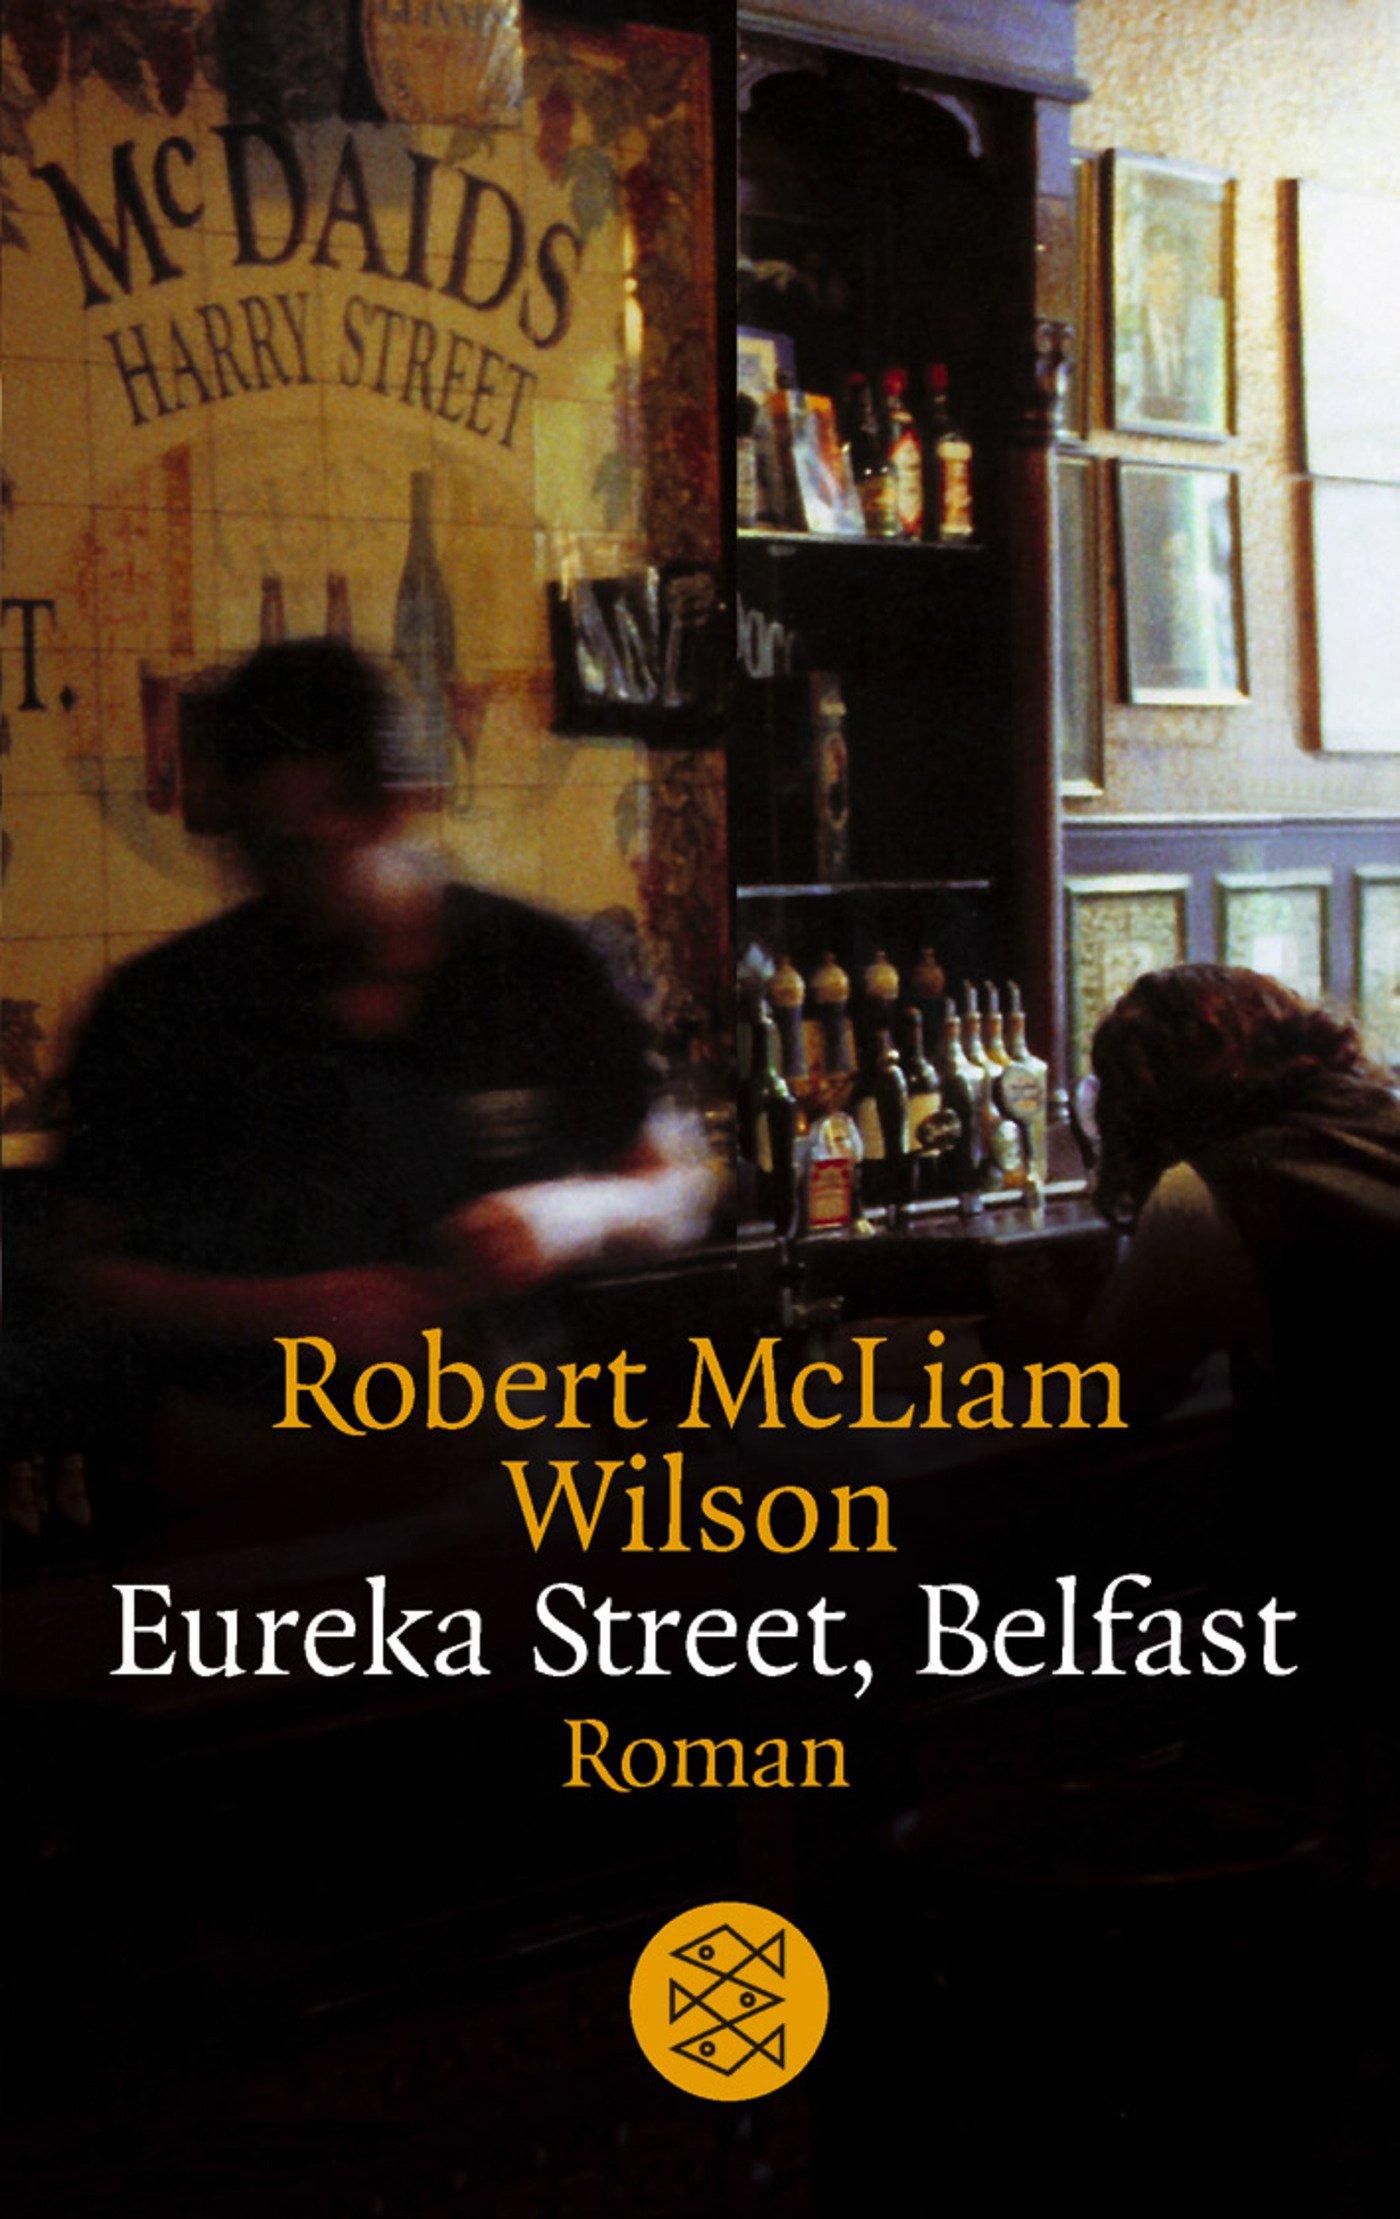 Eureka Street, Belfast: Roman